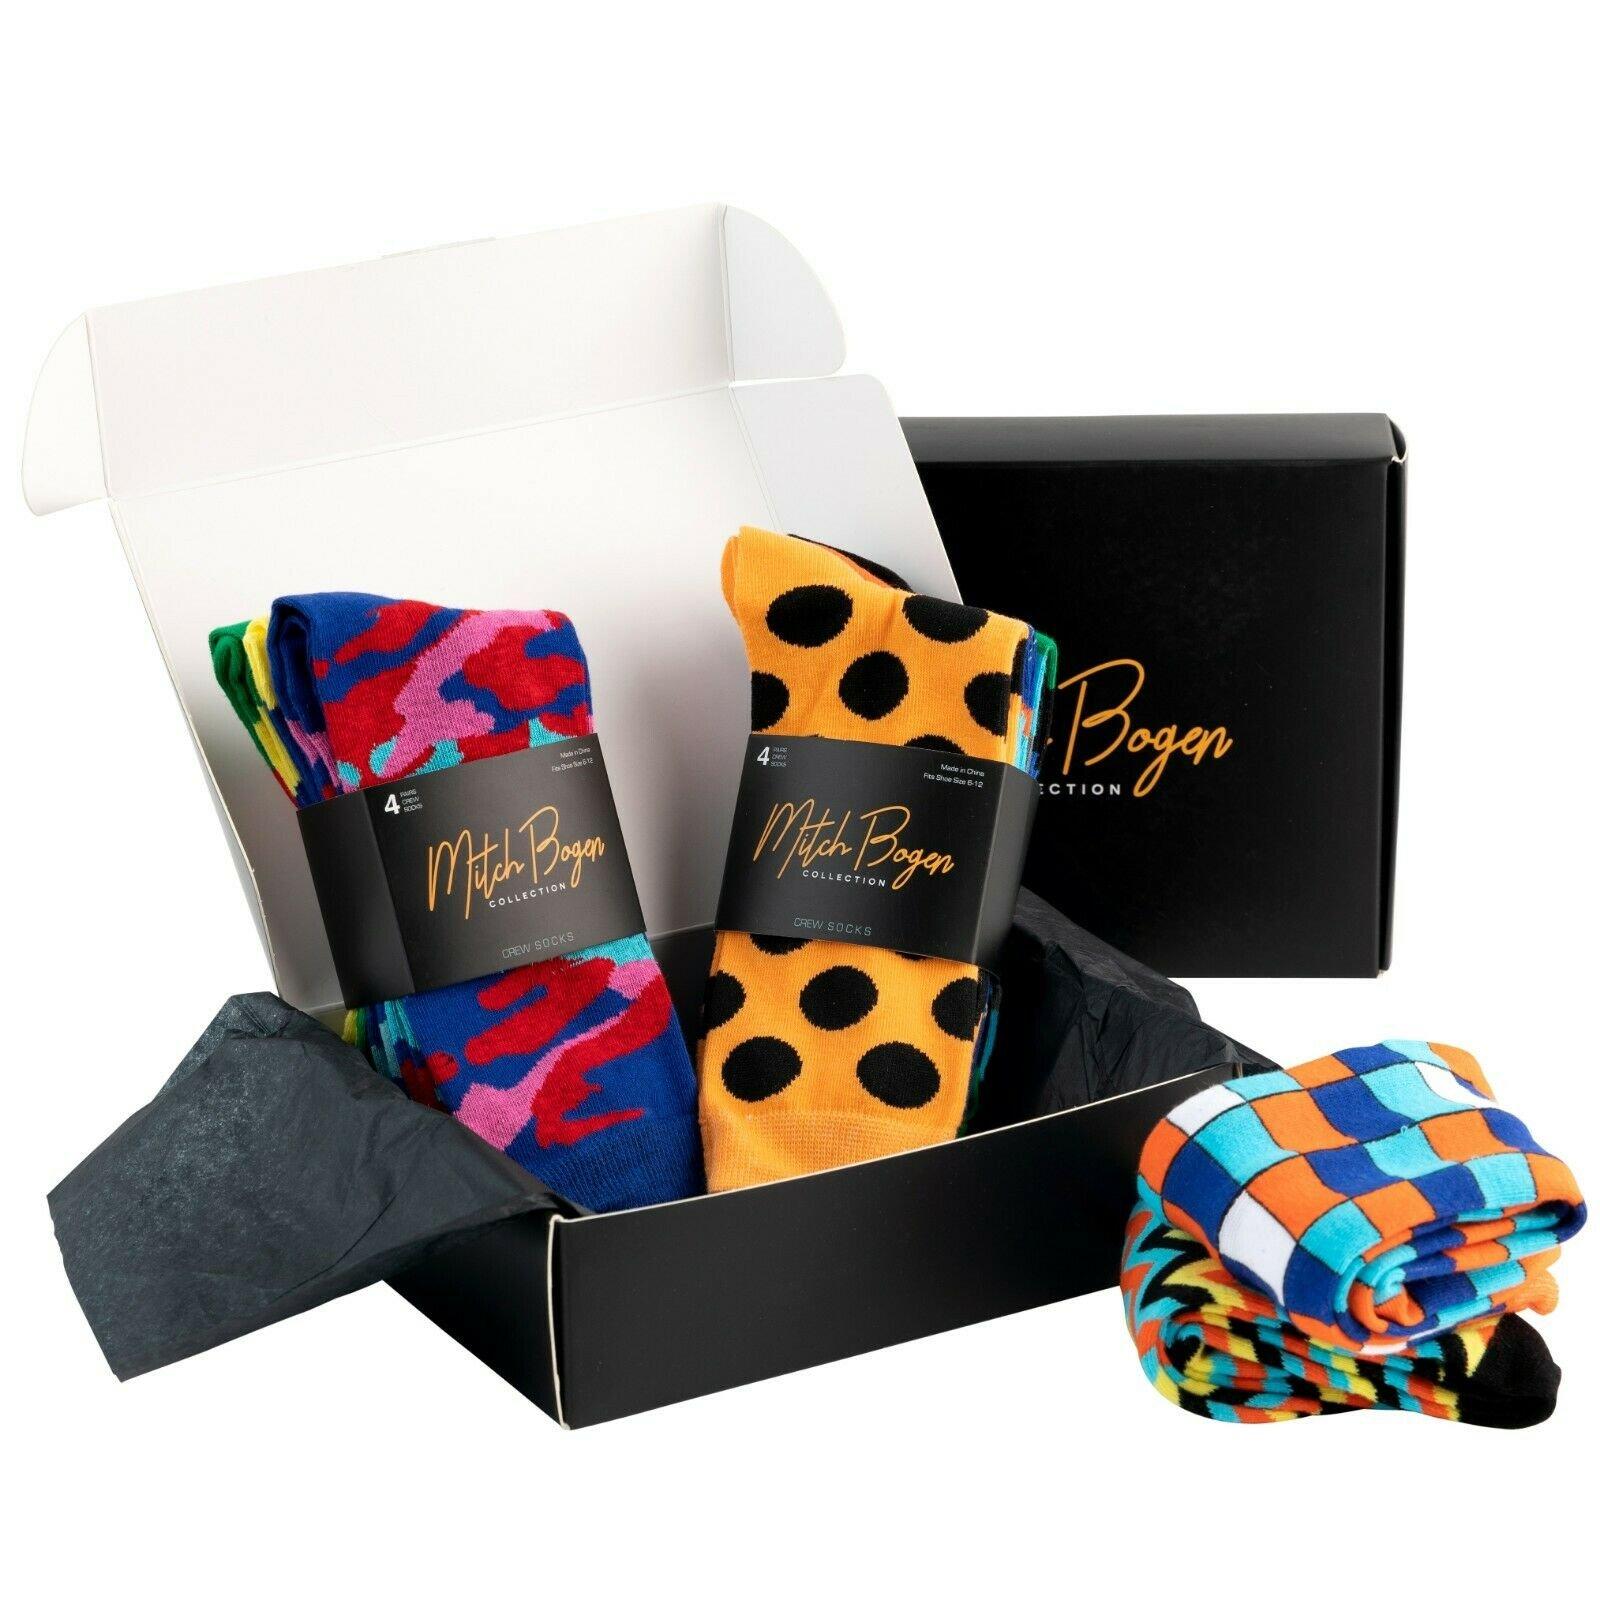 Mitch-Bogen-Mens-Cotton-Dress-Socks-Colorful-Fashion-Crew-Socks-8-Pack-Gift-Box thumbnail 48